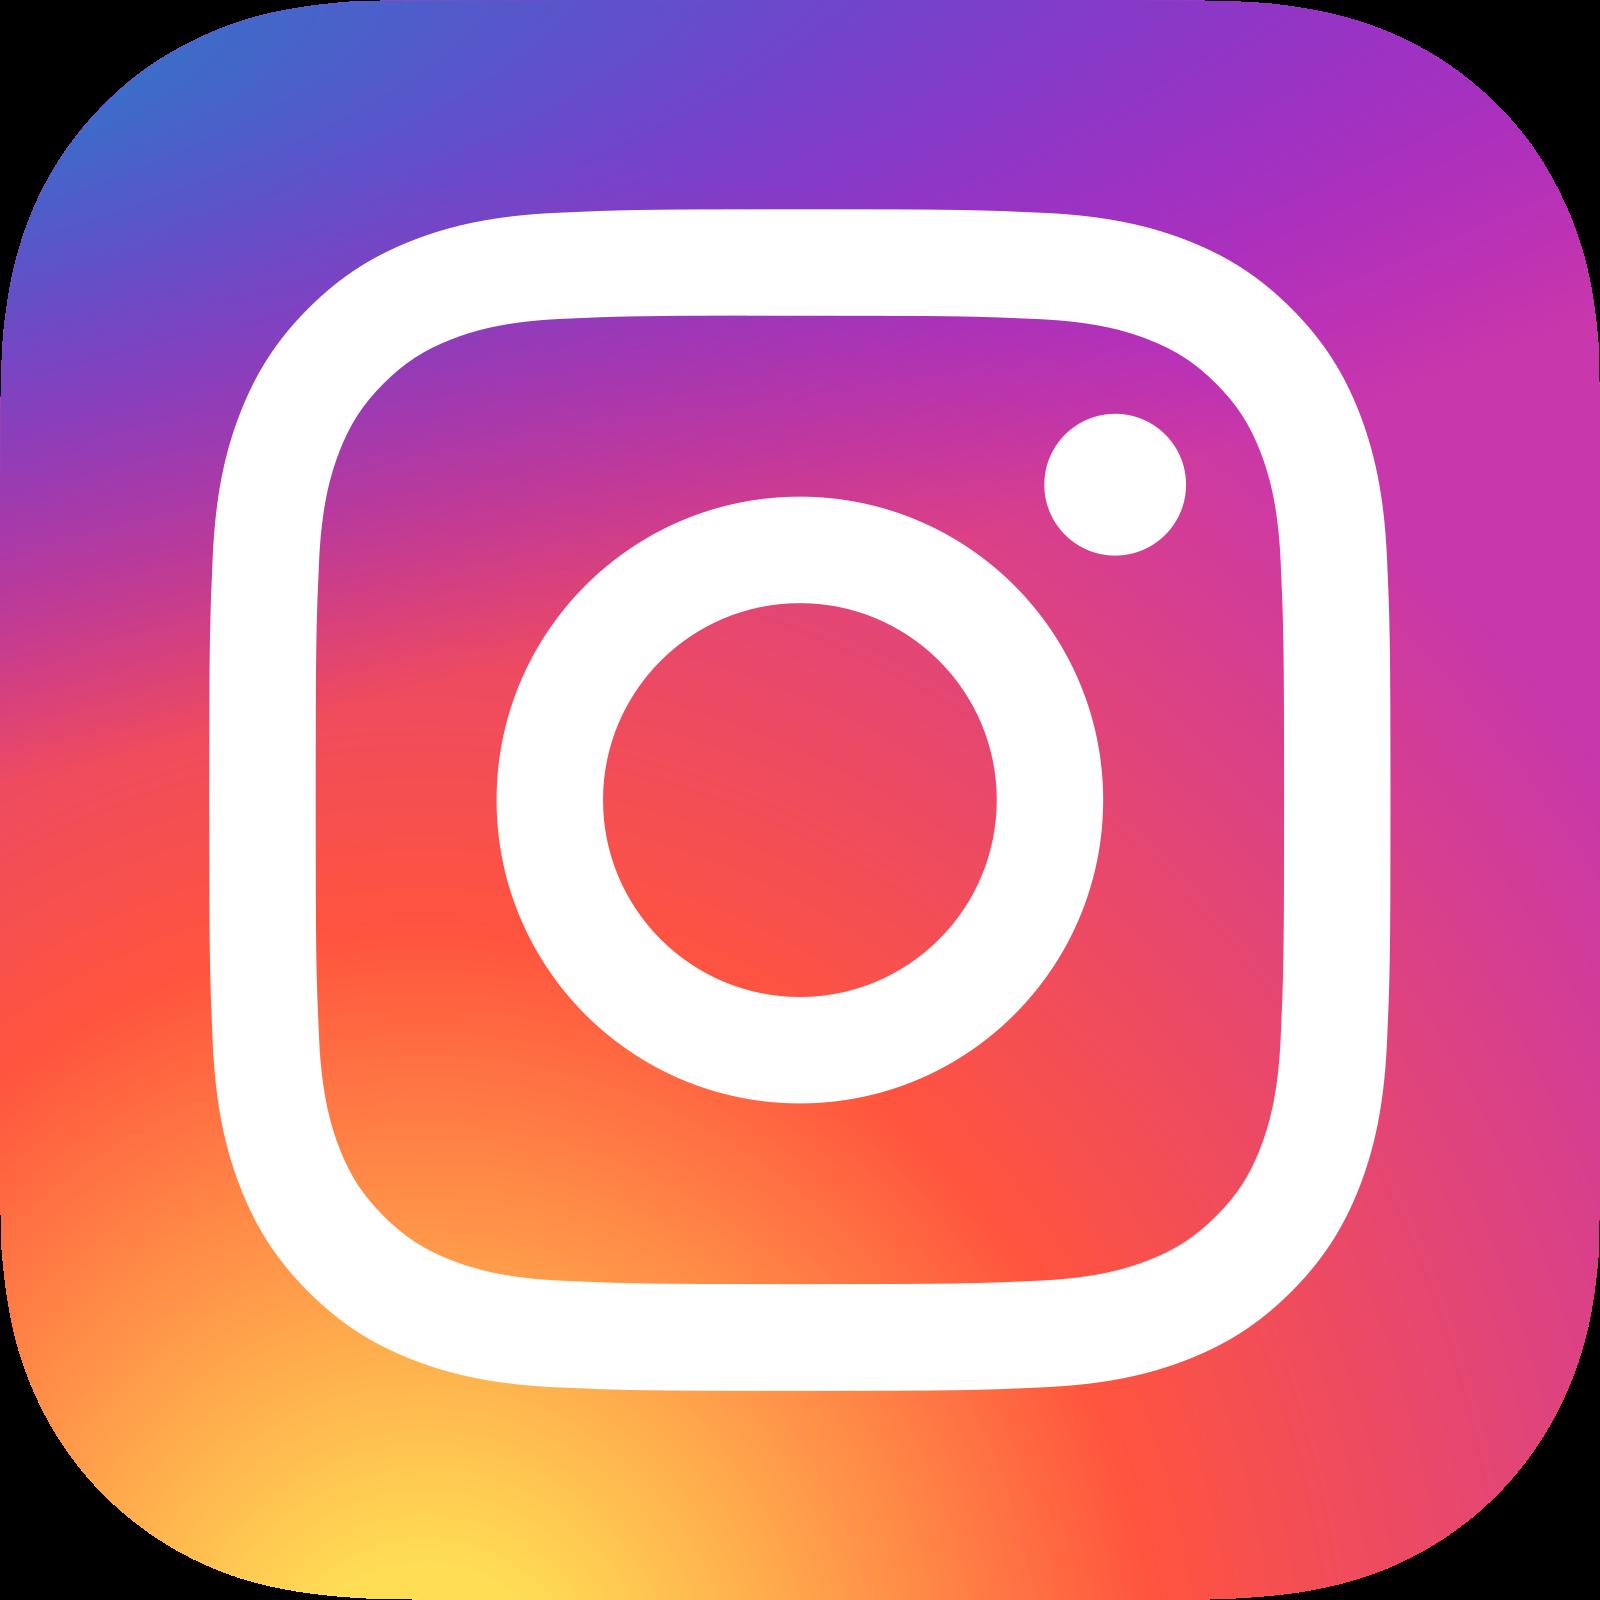 icone instagram 2 - Brasscom